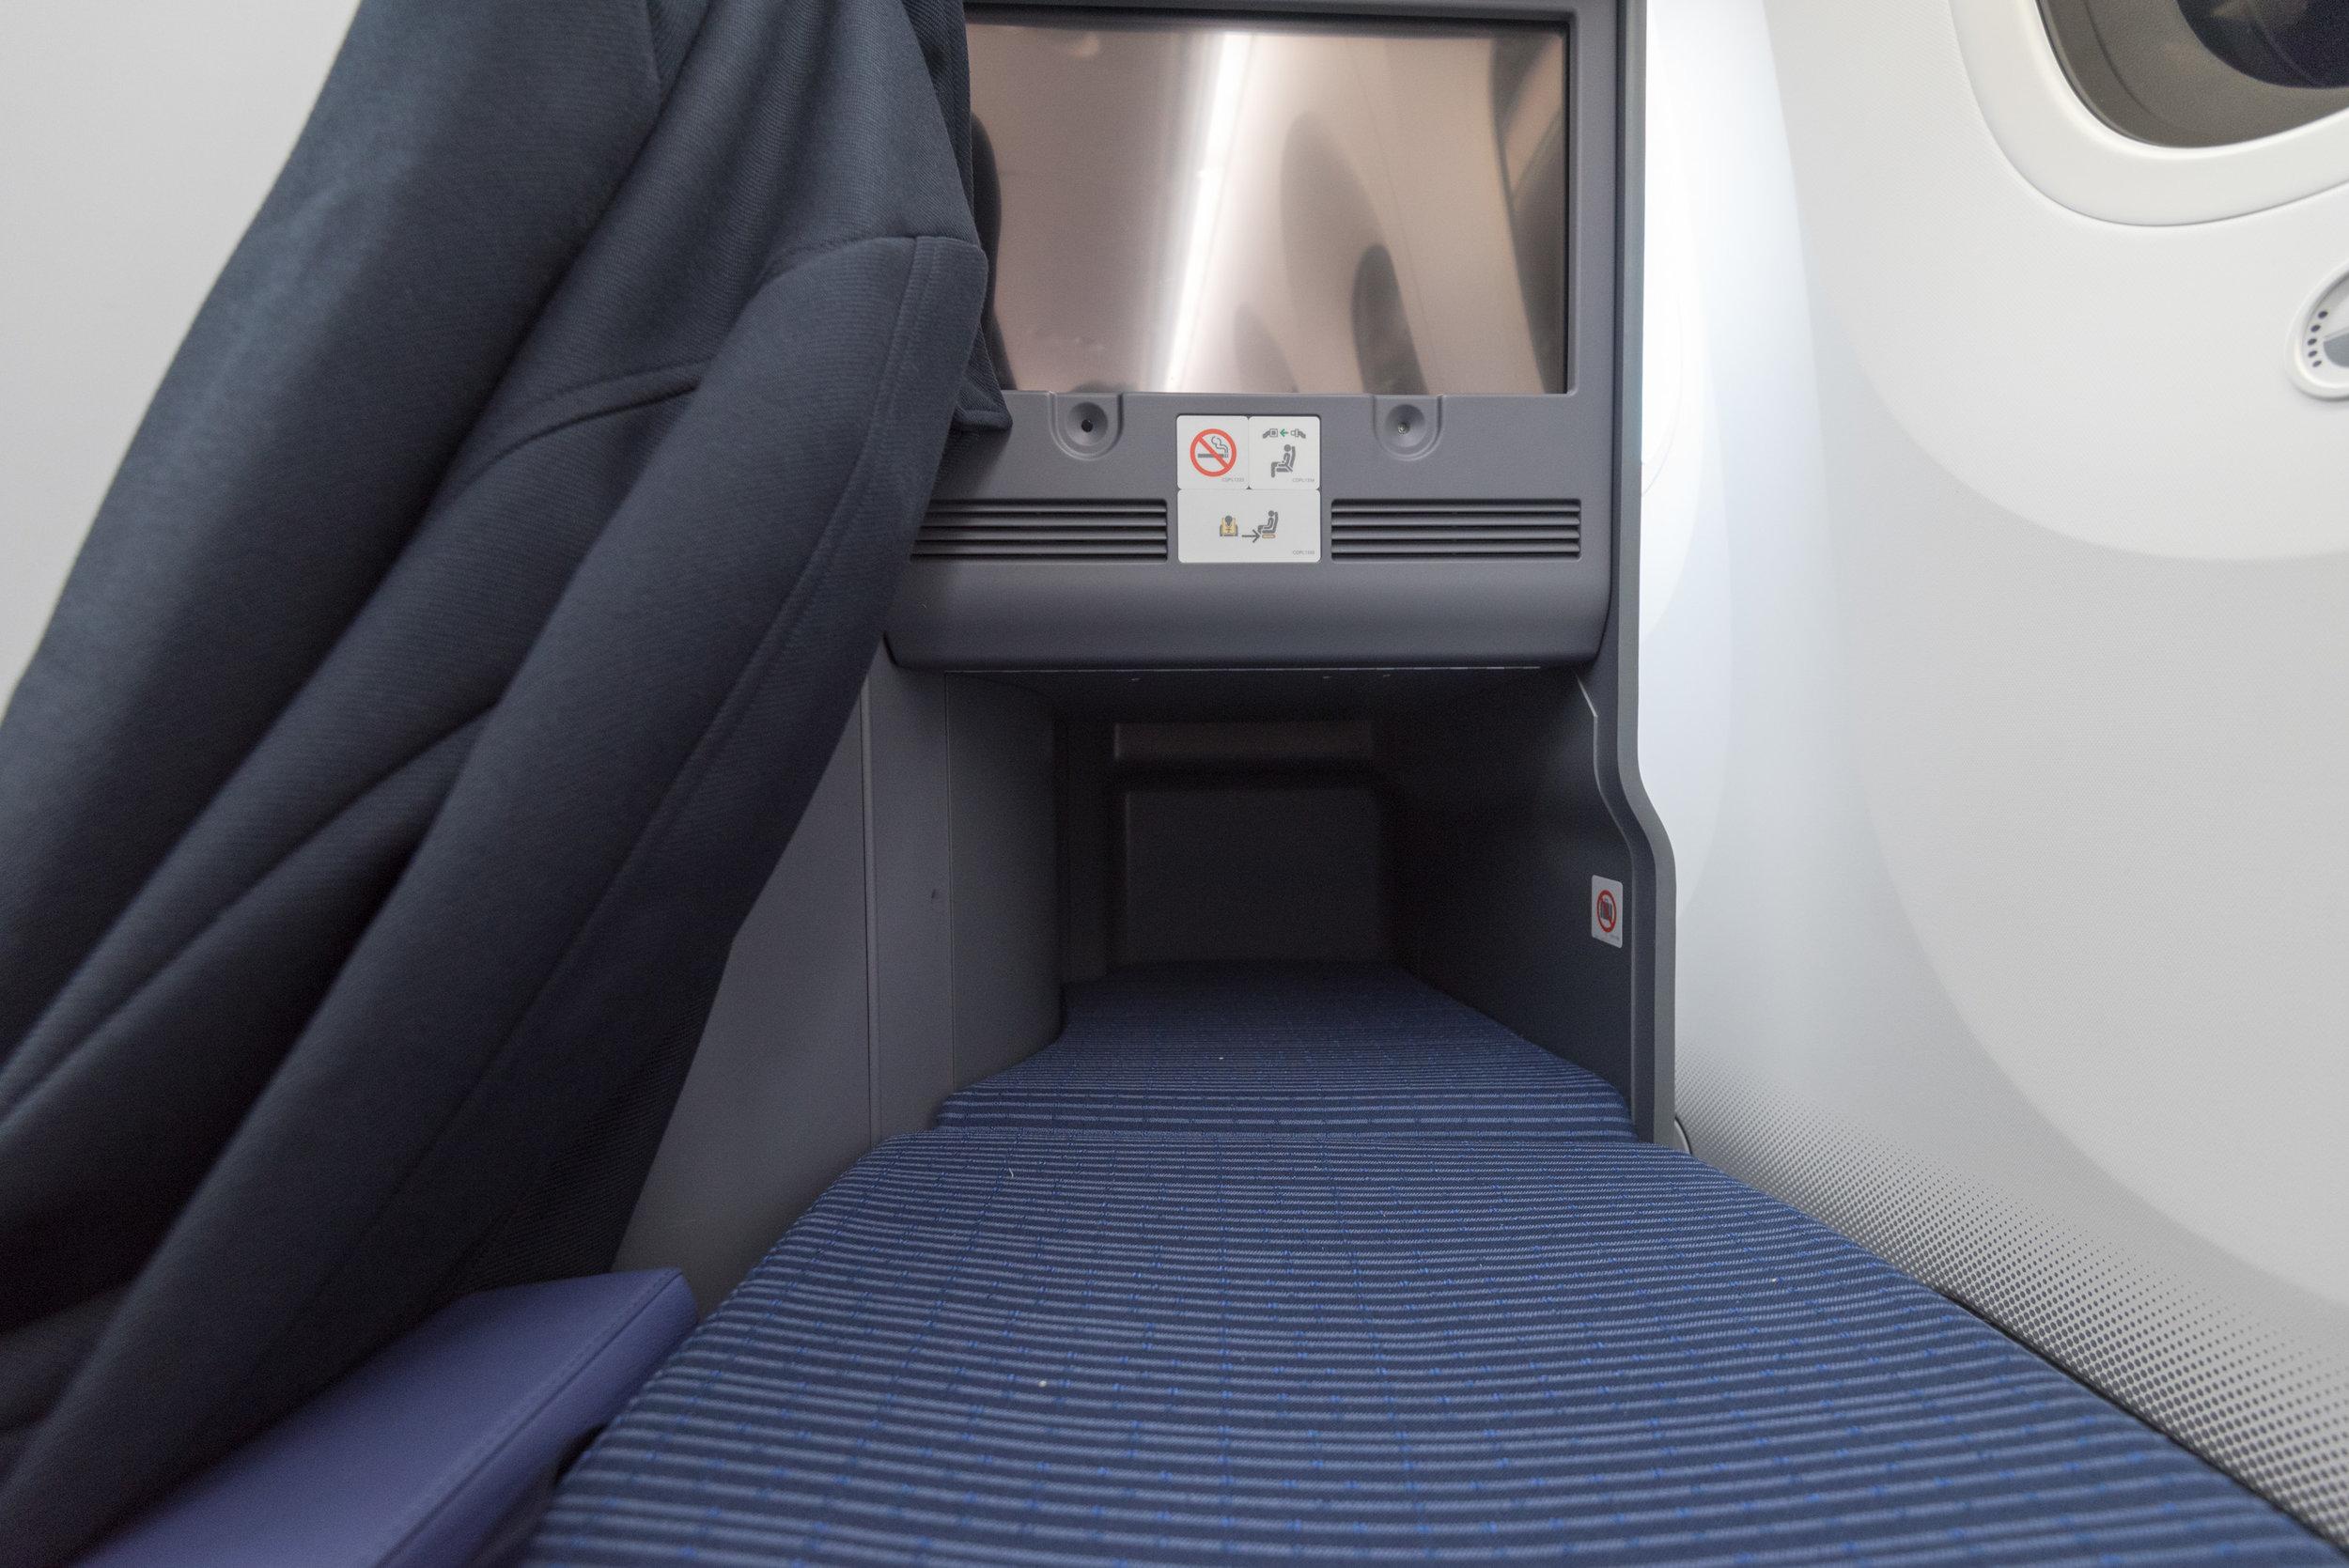 Flatbed  ANA Business Class 787-900 - NH859 (HND-HKG)